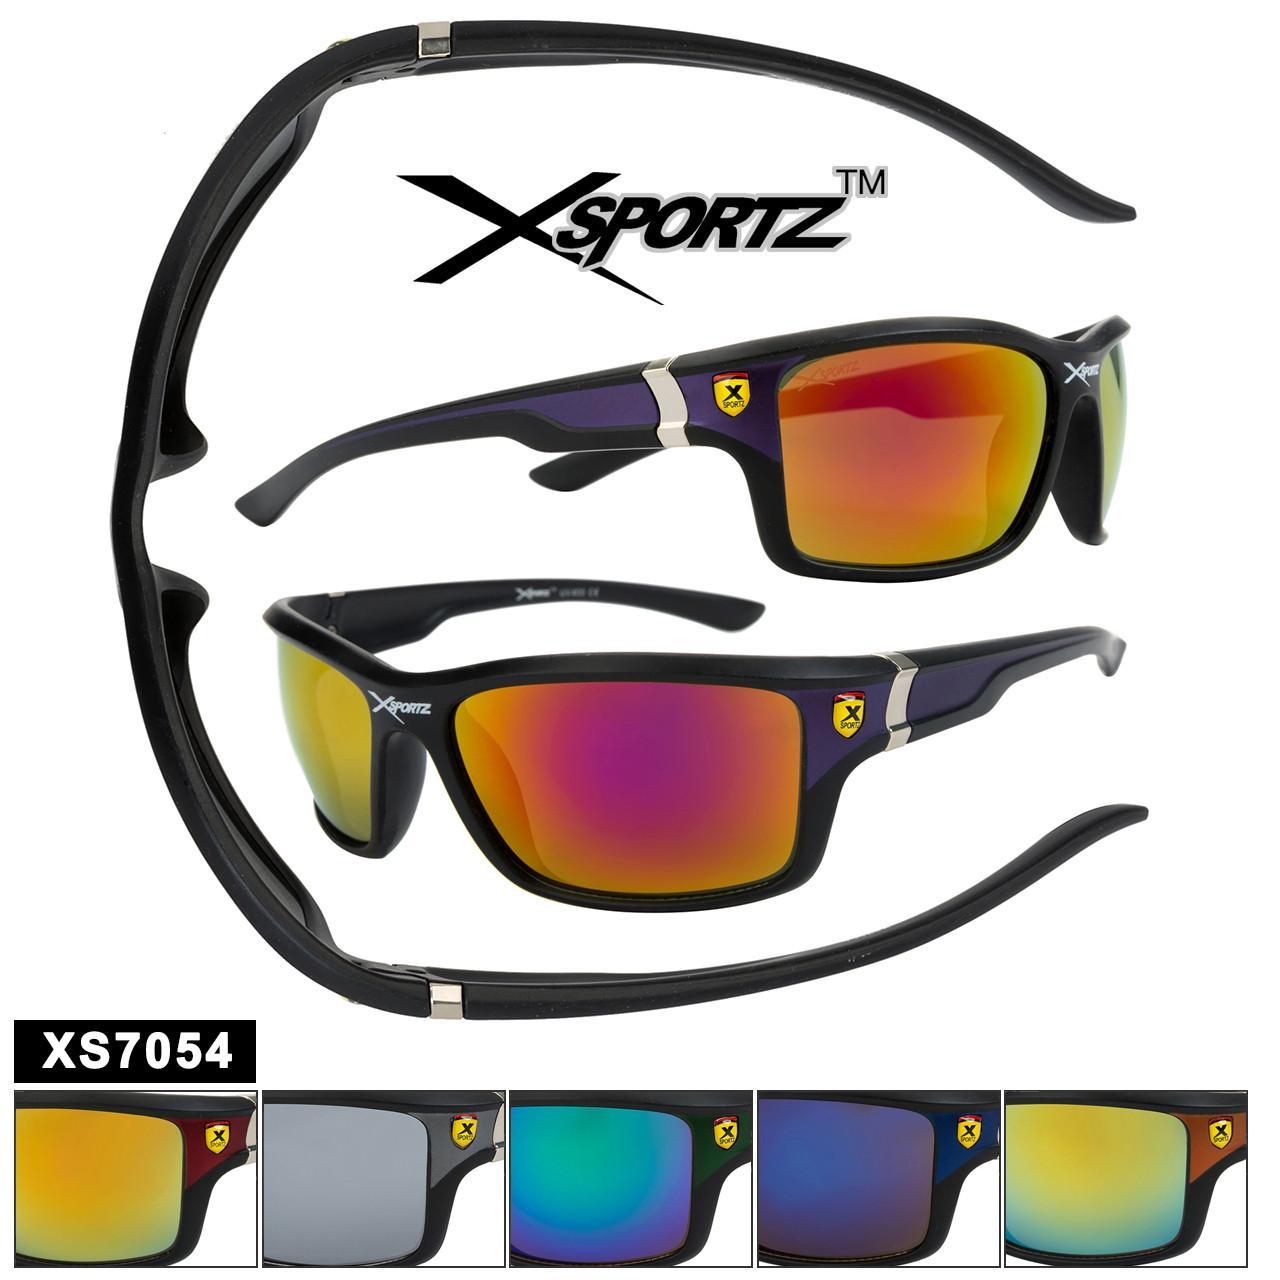 Mirrored Bulk Sports Sunglasses - Style XS7054